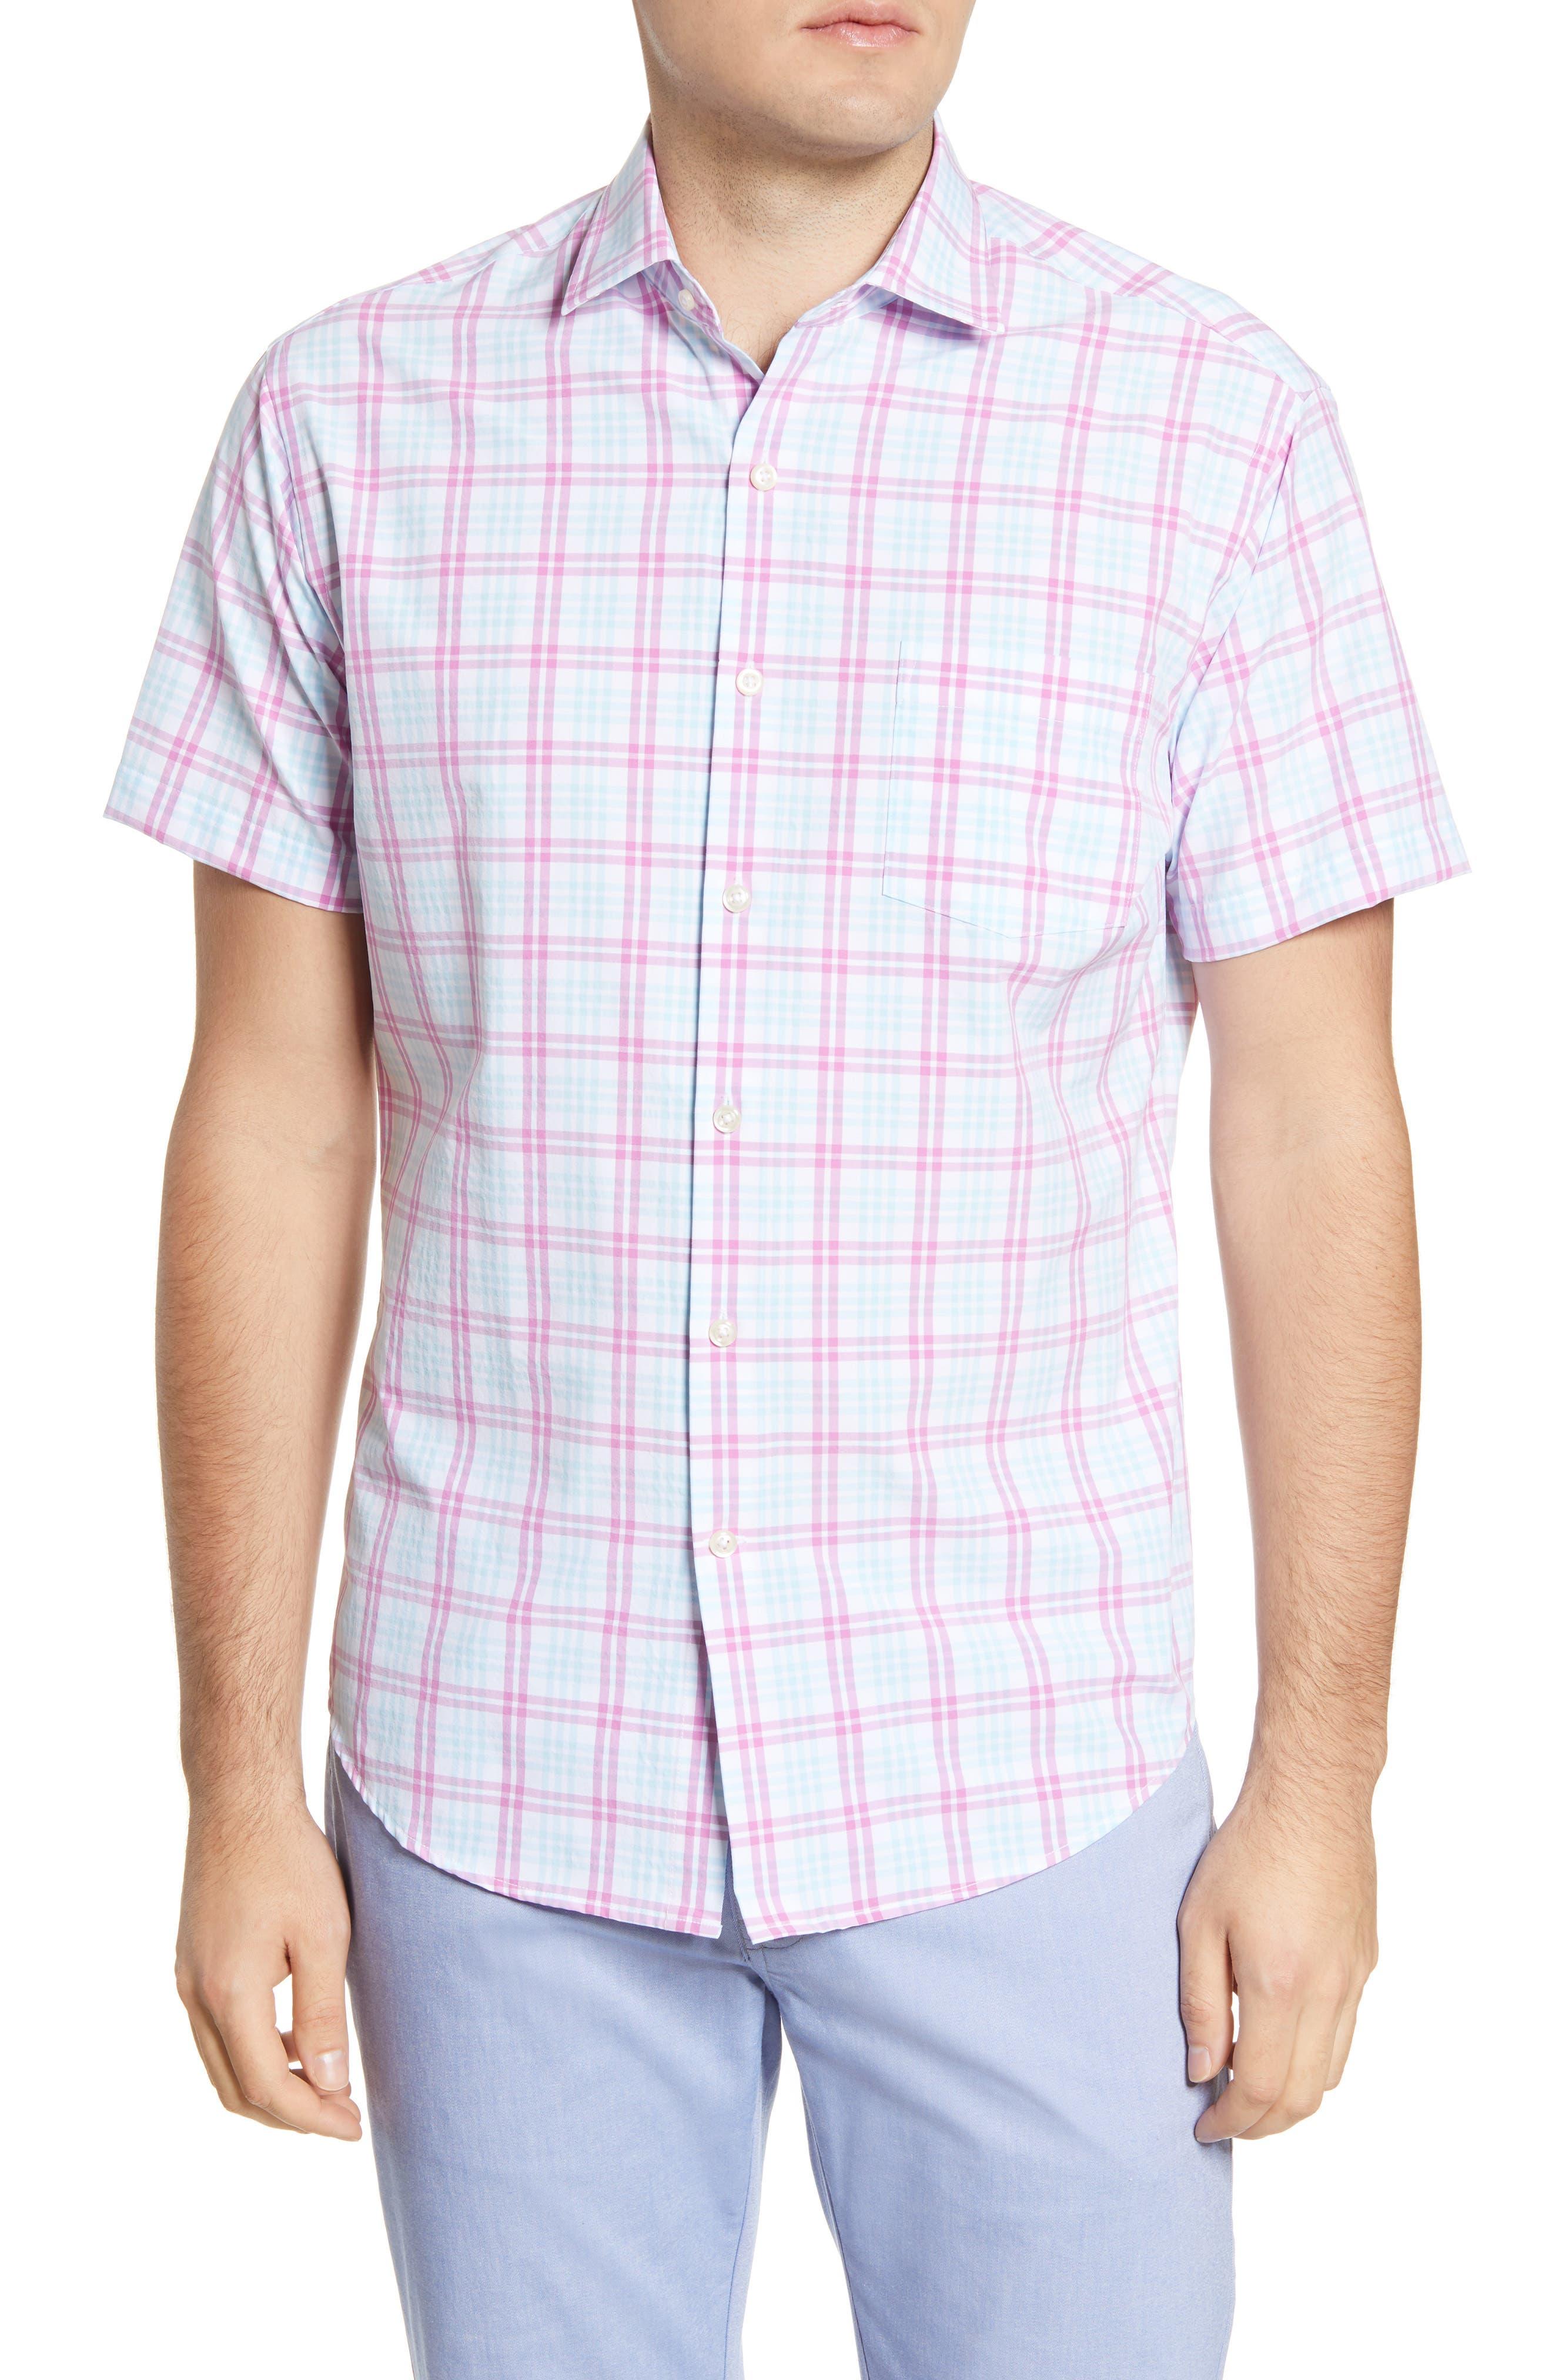 Image of Peter Millar Sonny Plaid Short Sleeve Regular Fit Shirt